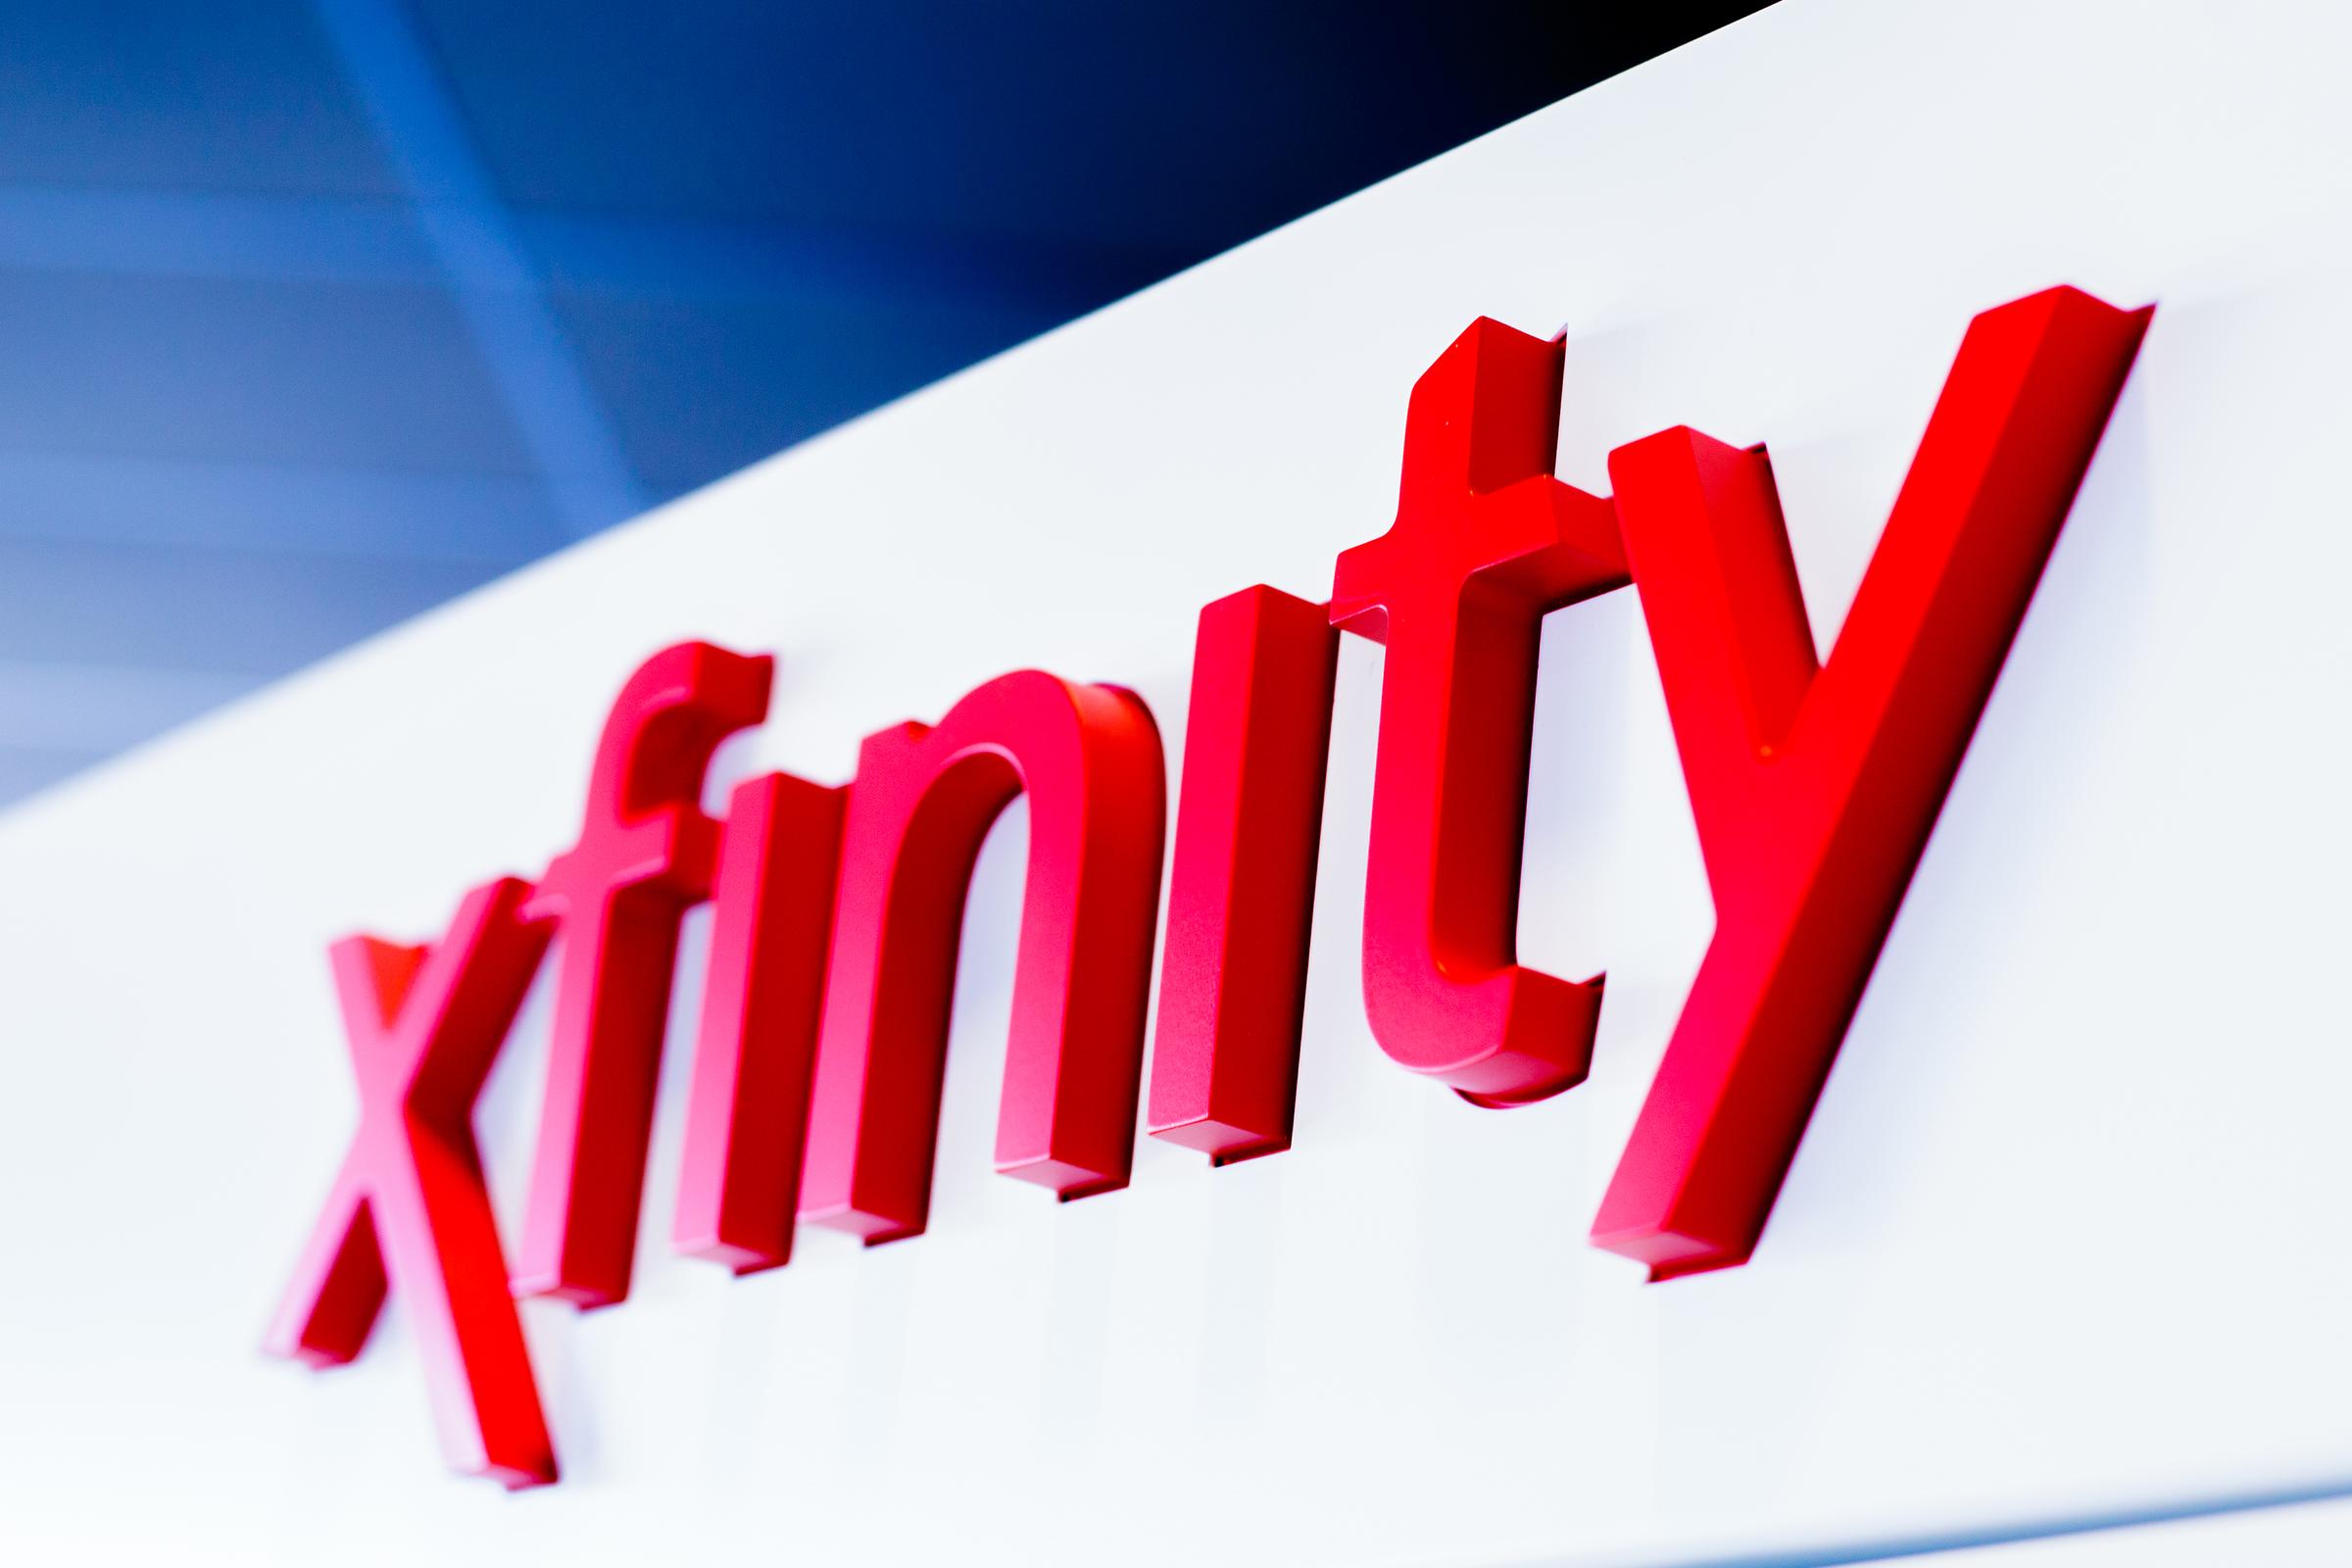 Xfinity Tips: EcoBill Paperless Billing